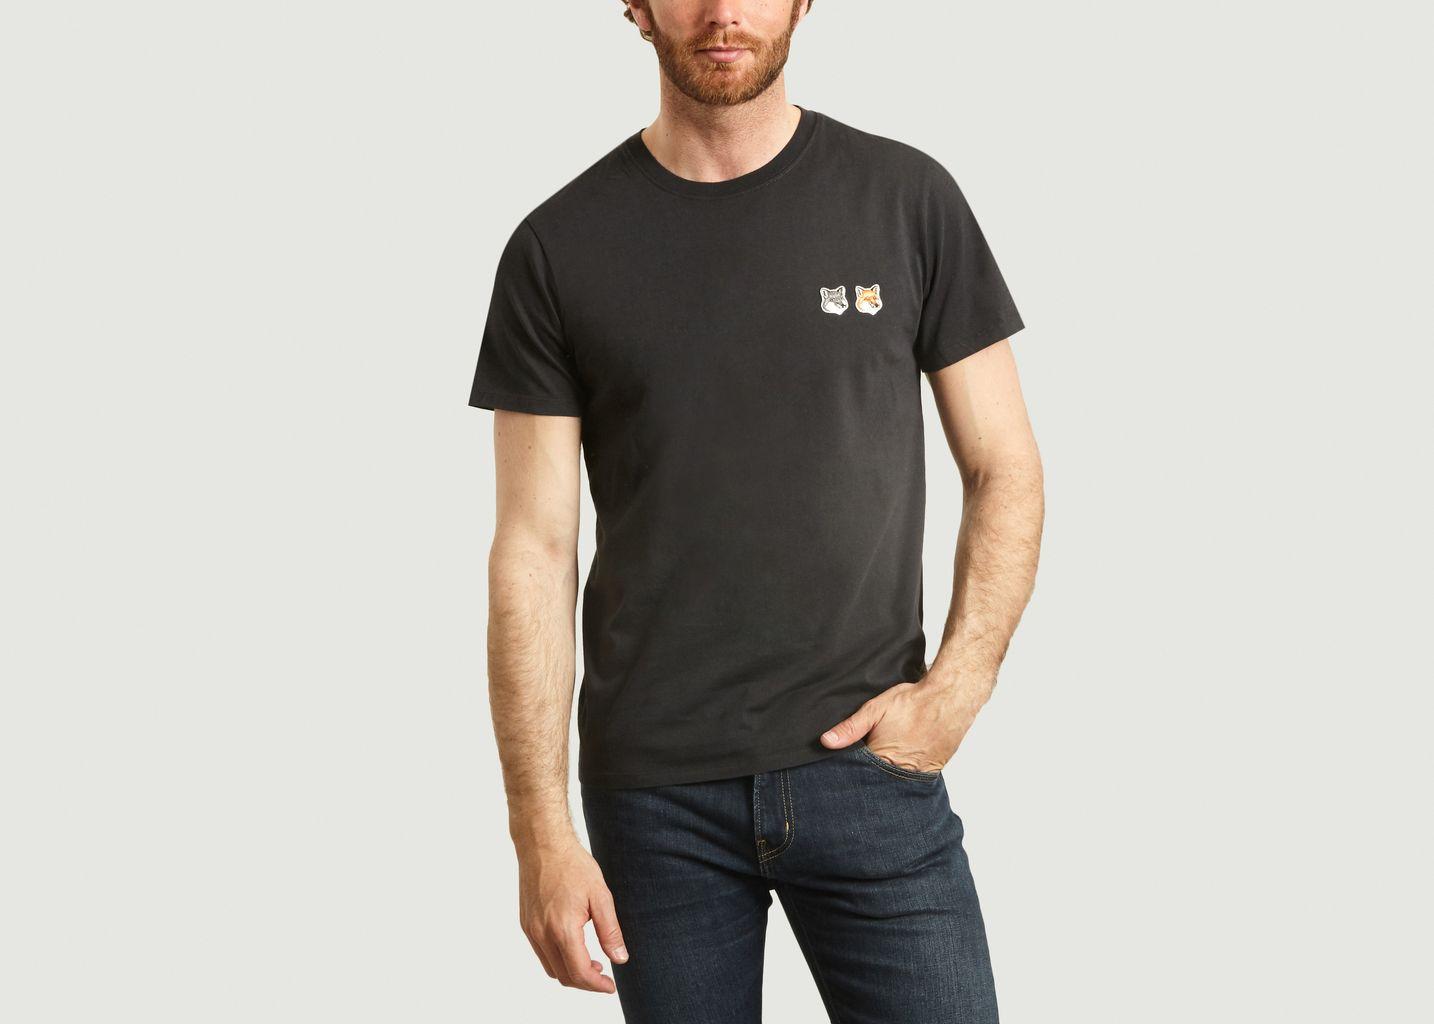 T-shirt brodé renards unisexe - Maison Kitsuné